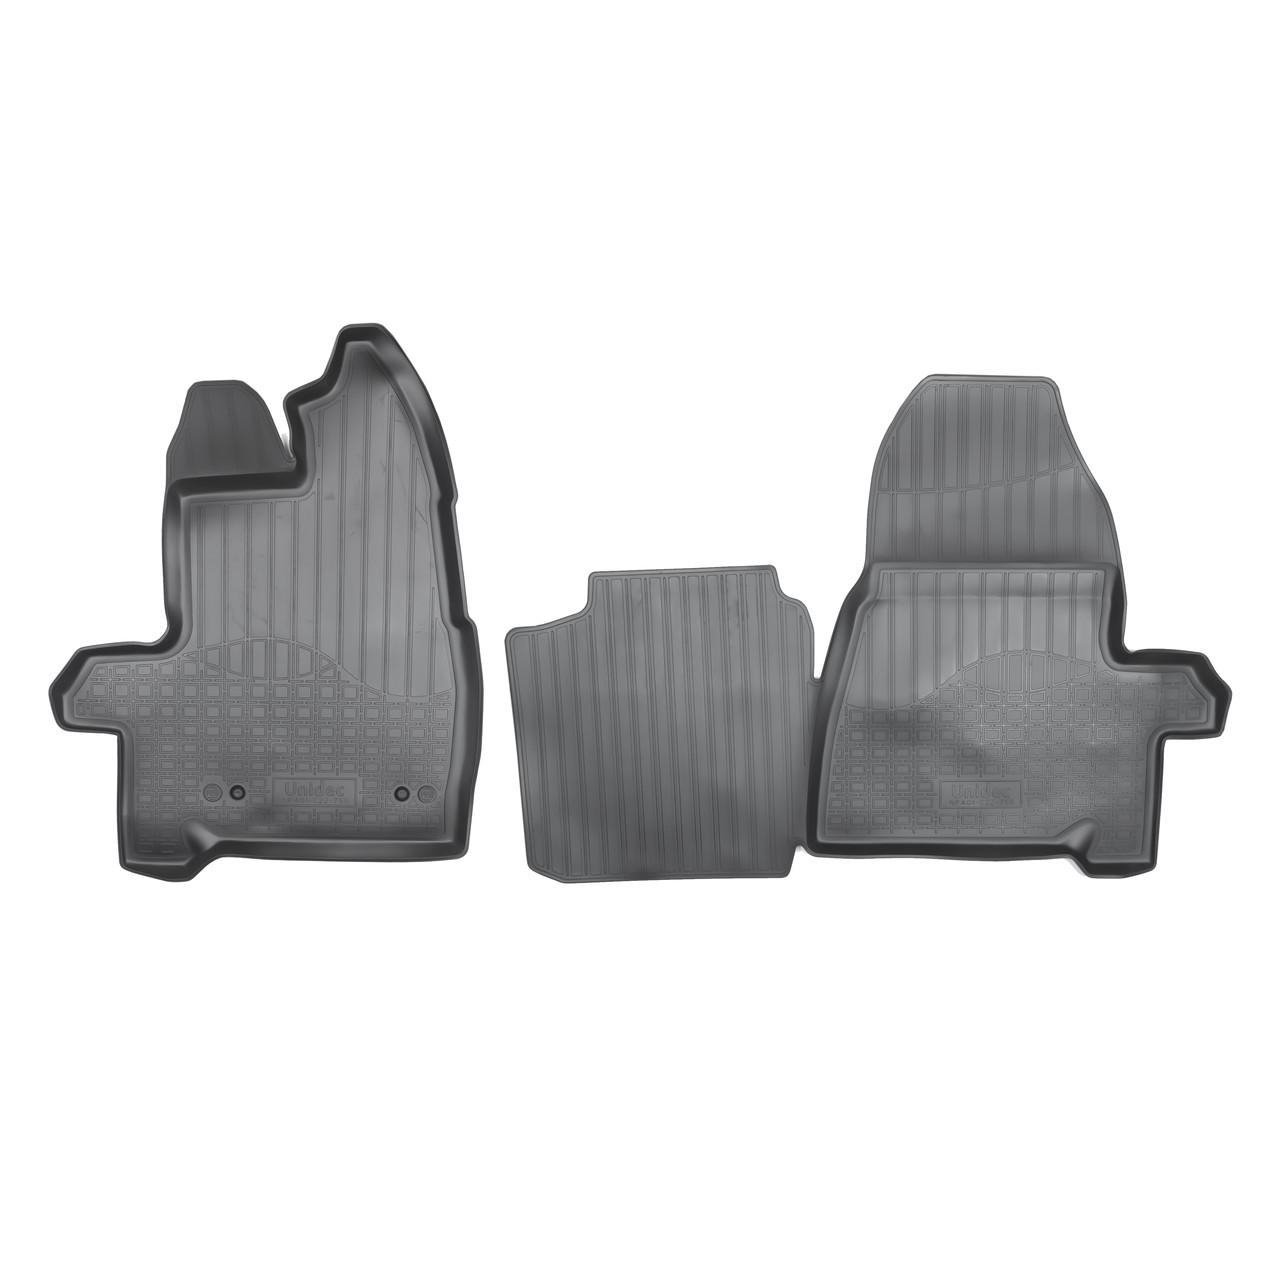 Коврики в салон Ford Transit Tourneo Custom (2013) (короткая база) (пер)